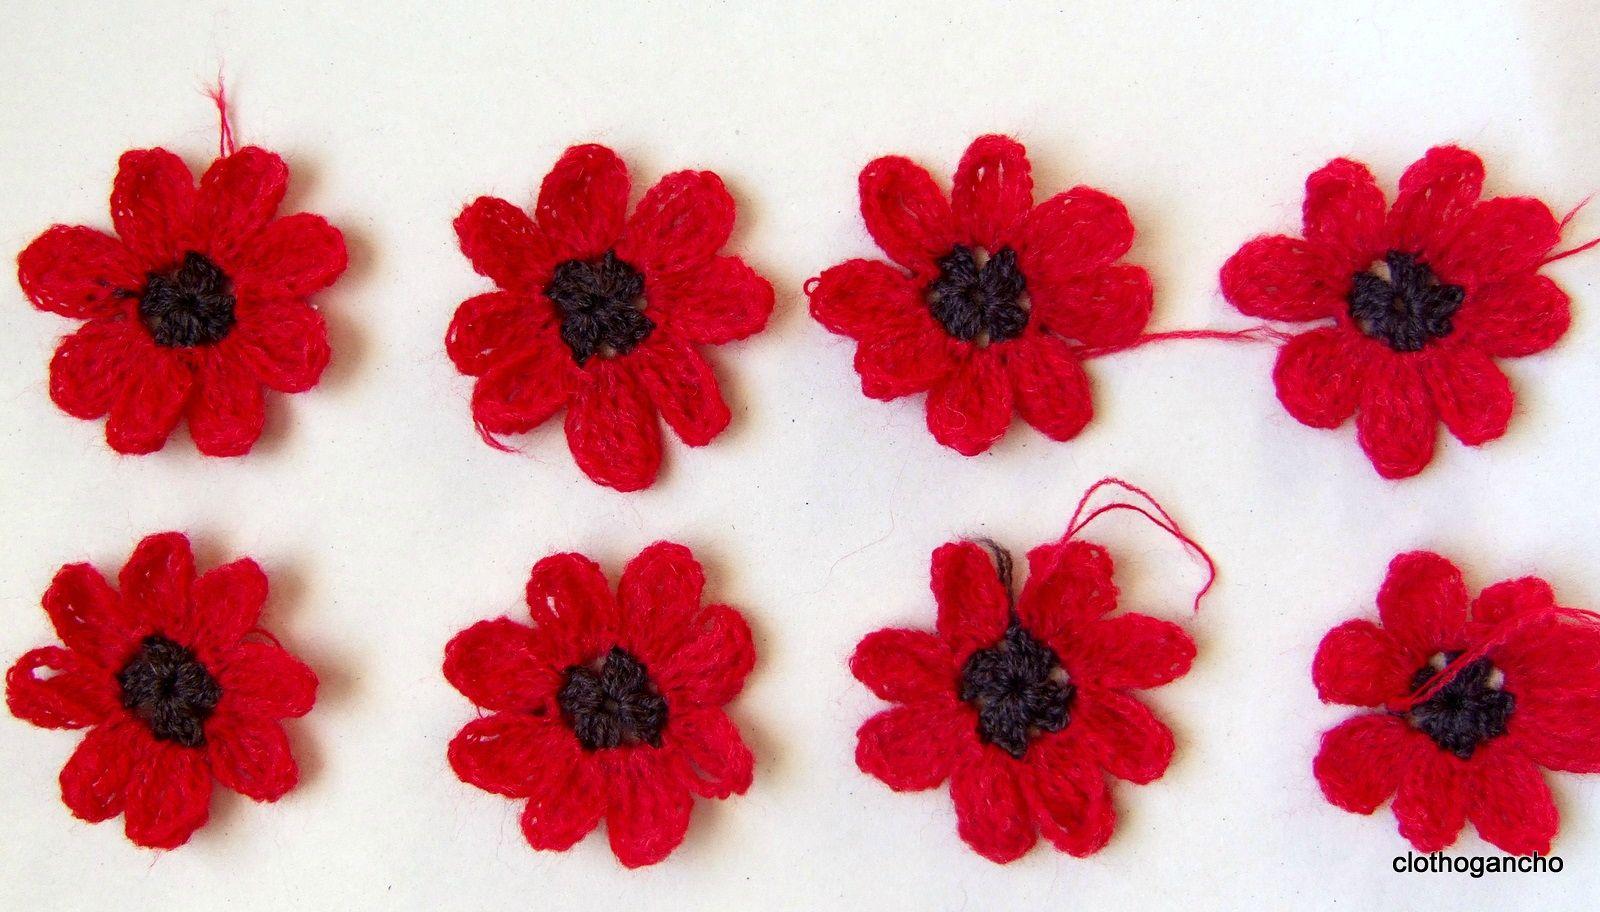 Dscf5132 Charpes Et Snoods Pinterest Crochet Flowers Rose Flores Crochetflowers Pretty Flower Diagram Motifcrochet Flowerscrochet